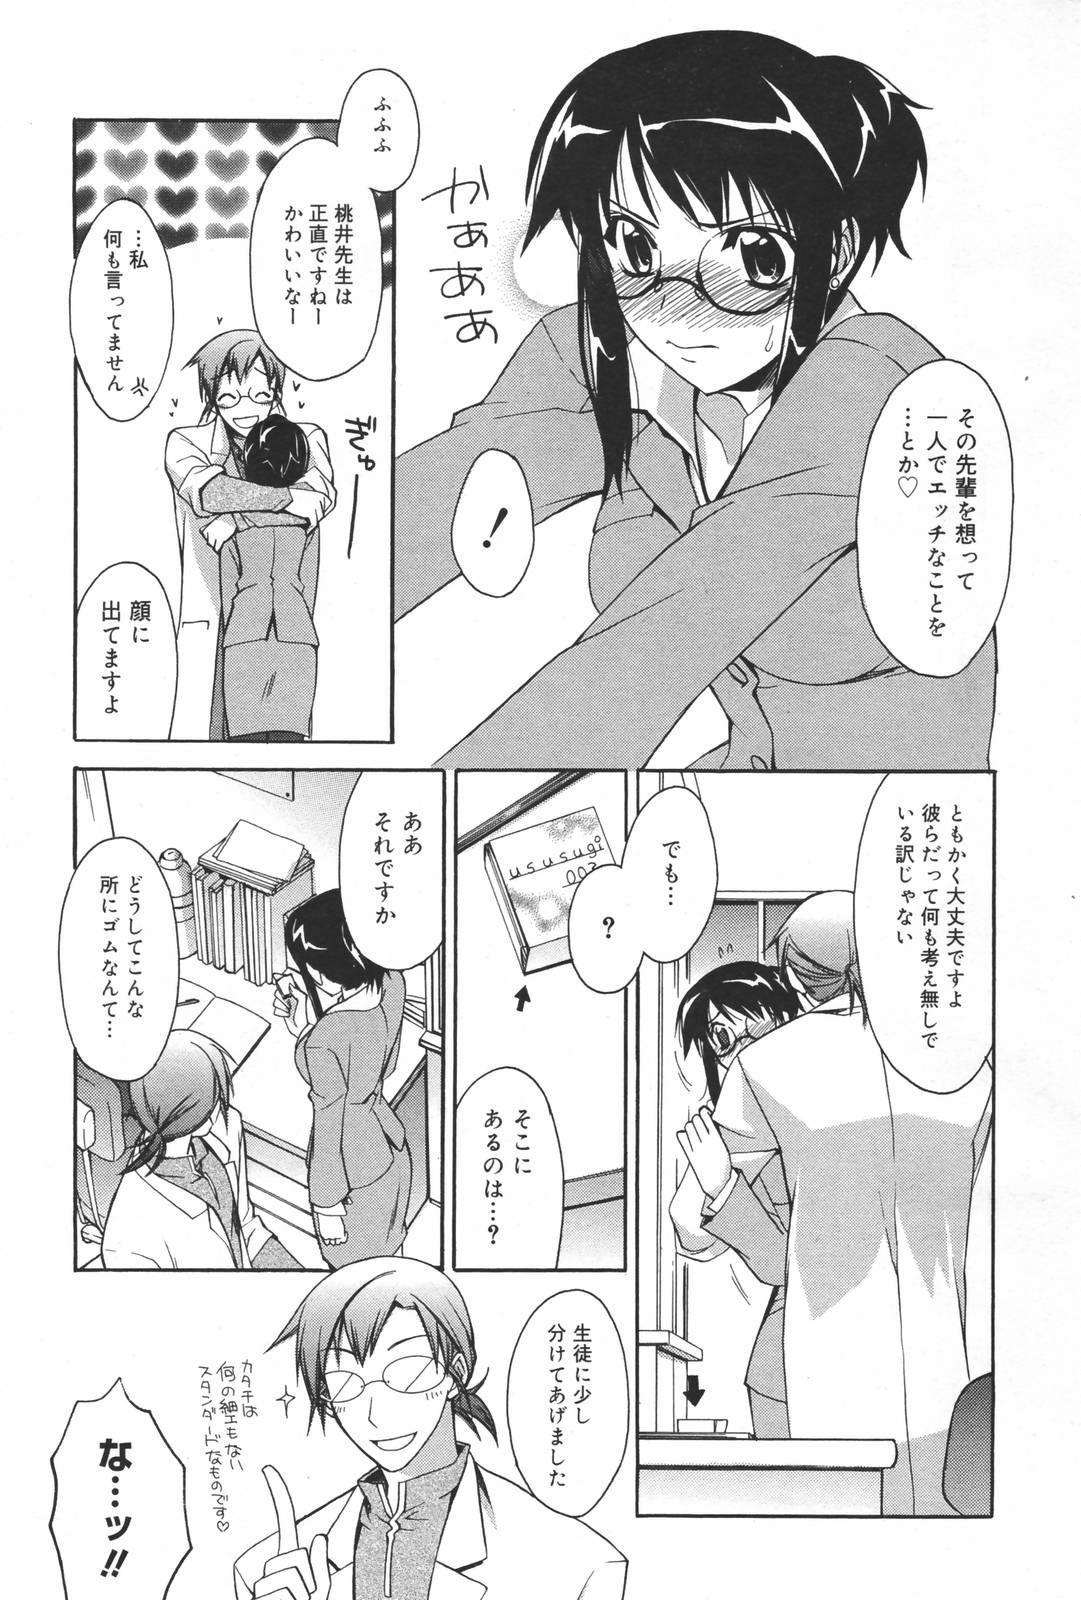 Manga Bangaichi 2007-03 22